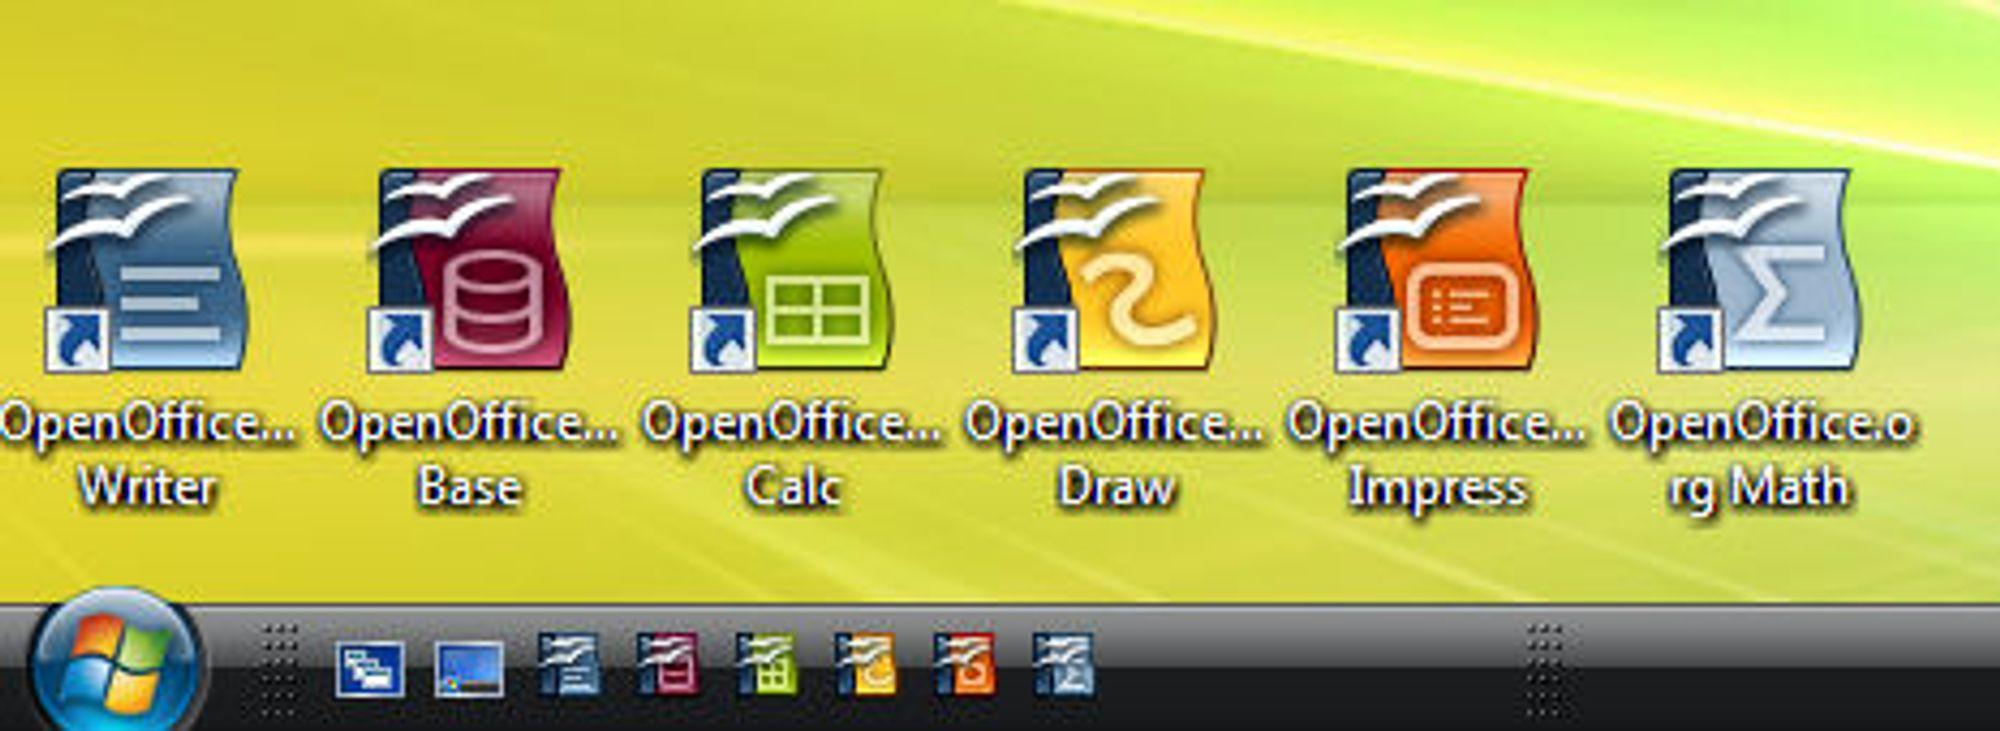 åpne xlsx filer i openoffice